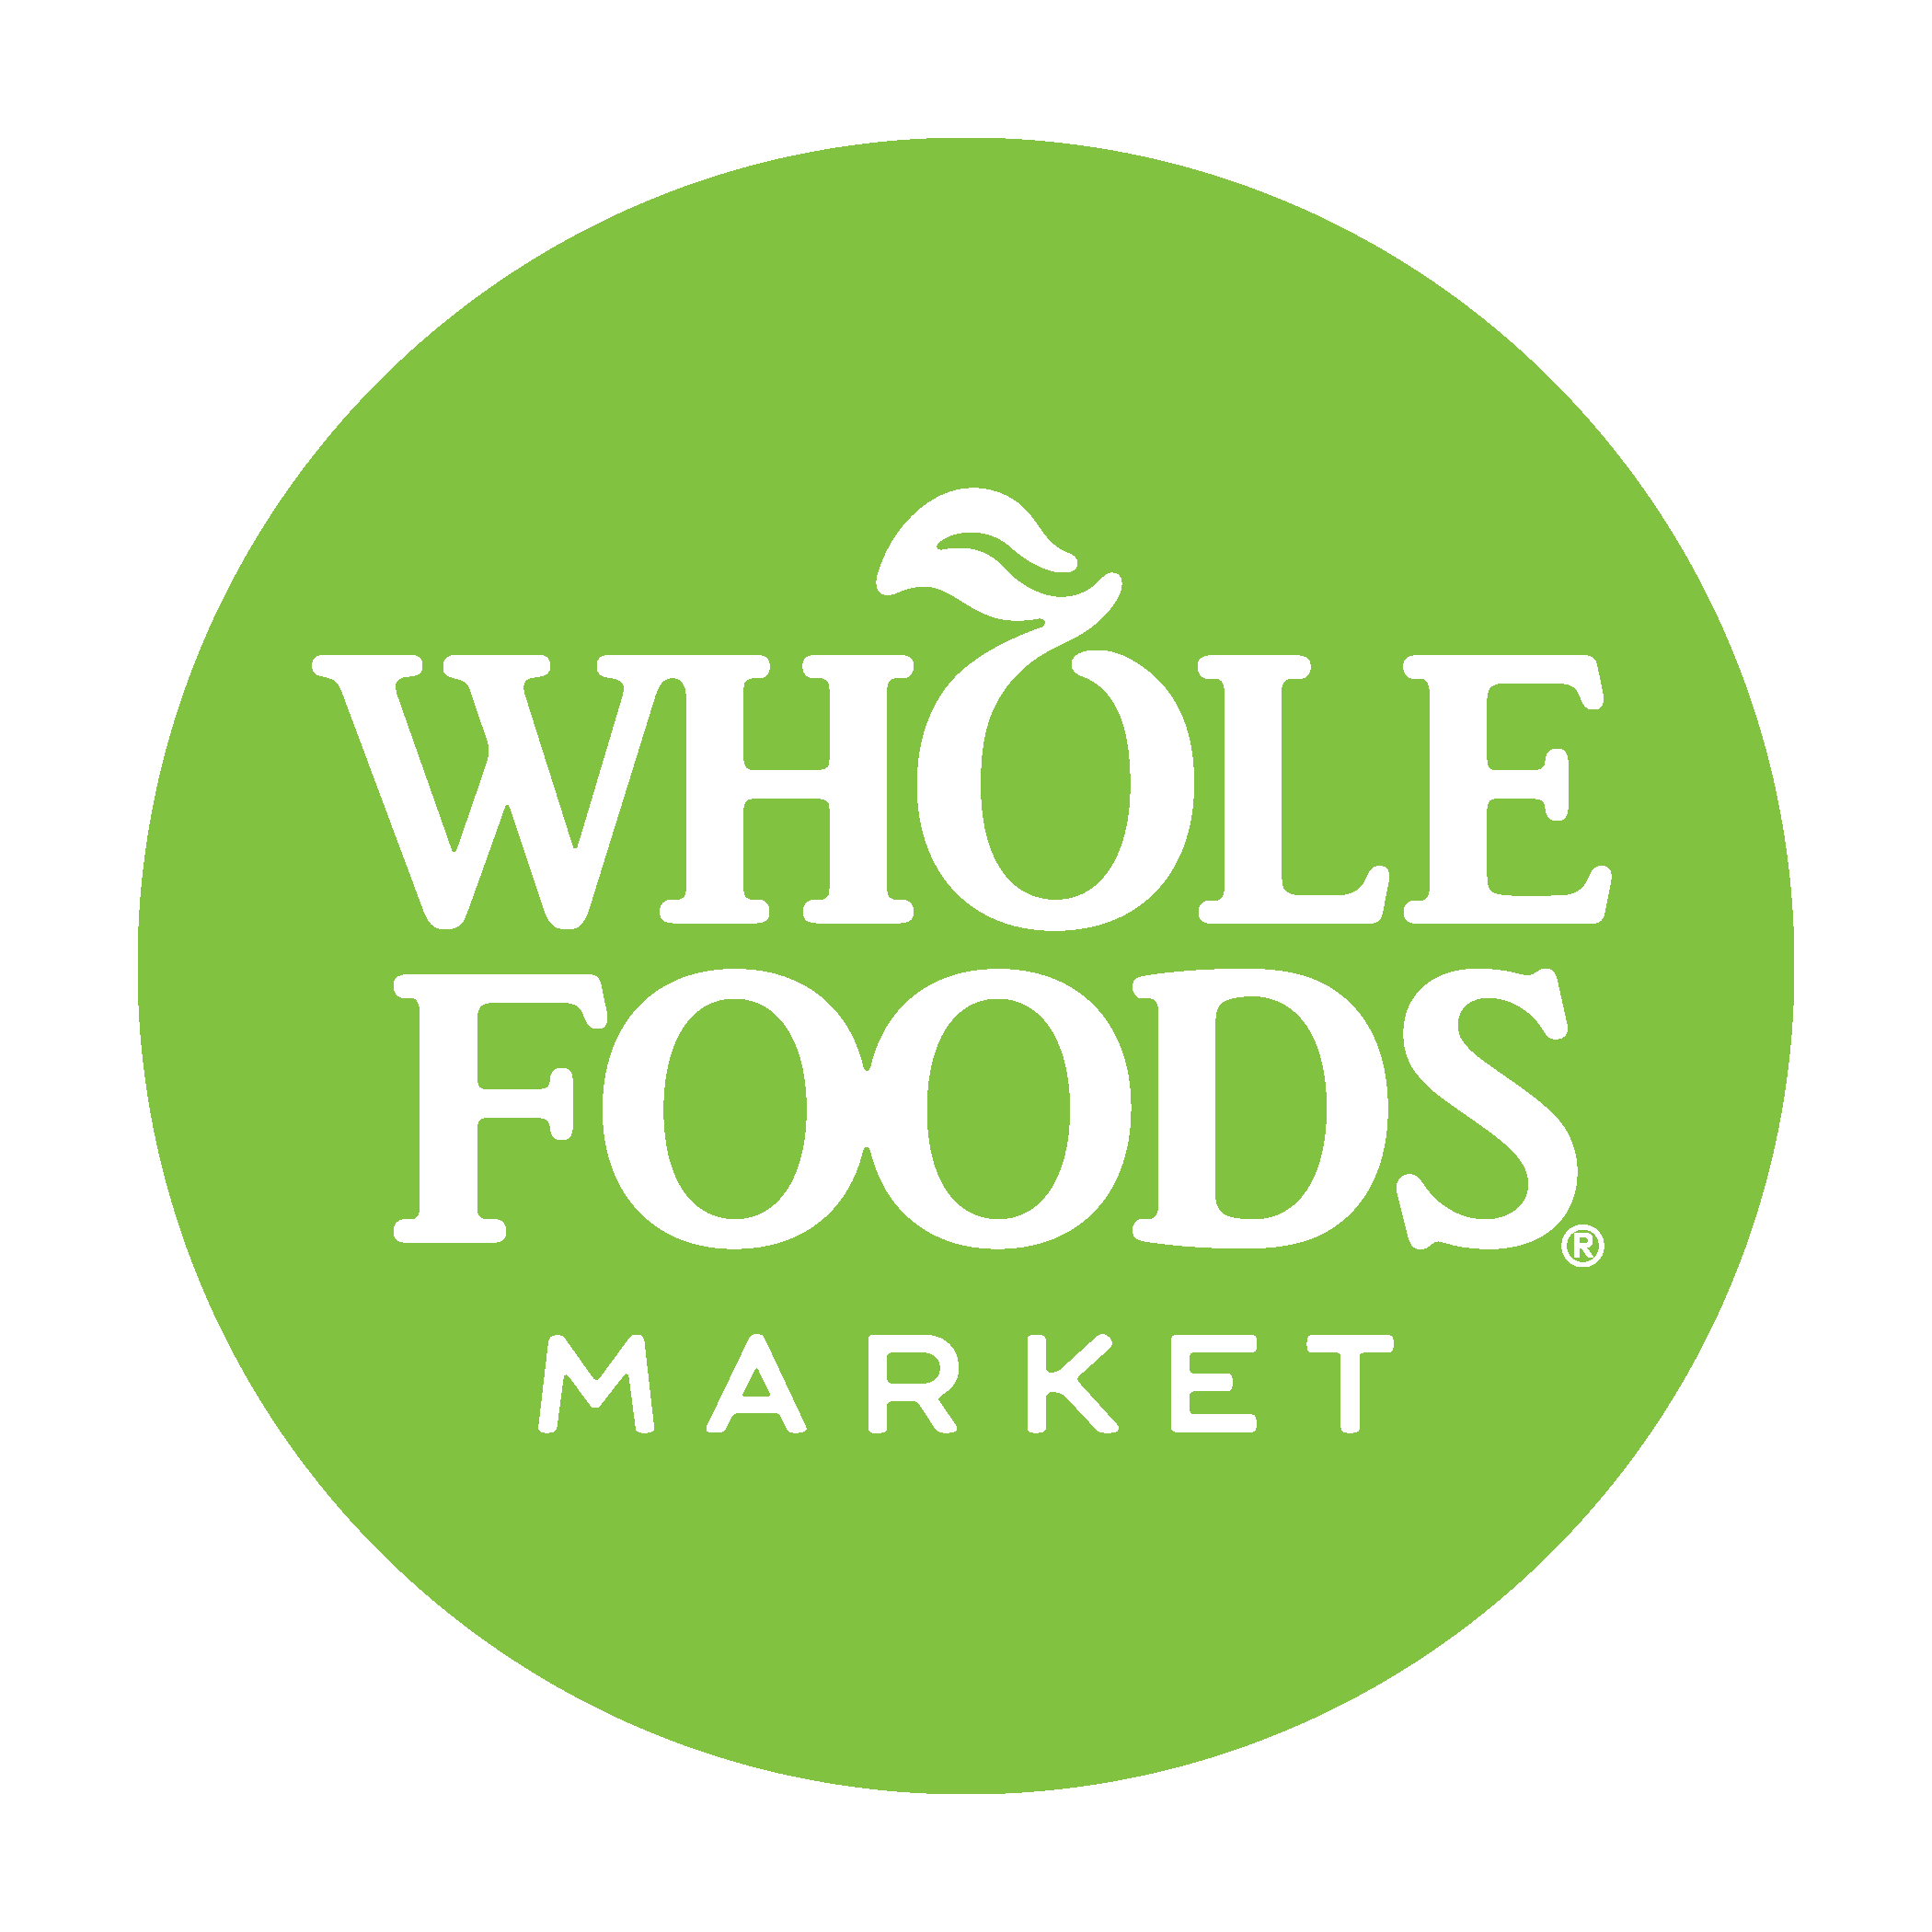 Whole Foods Market Logo PNG Image.